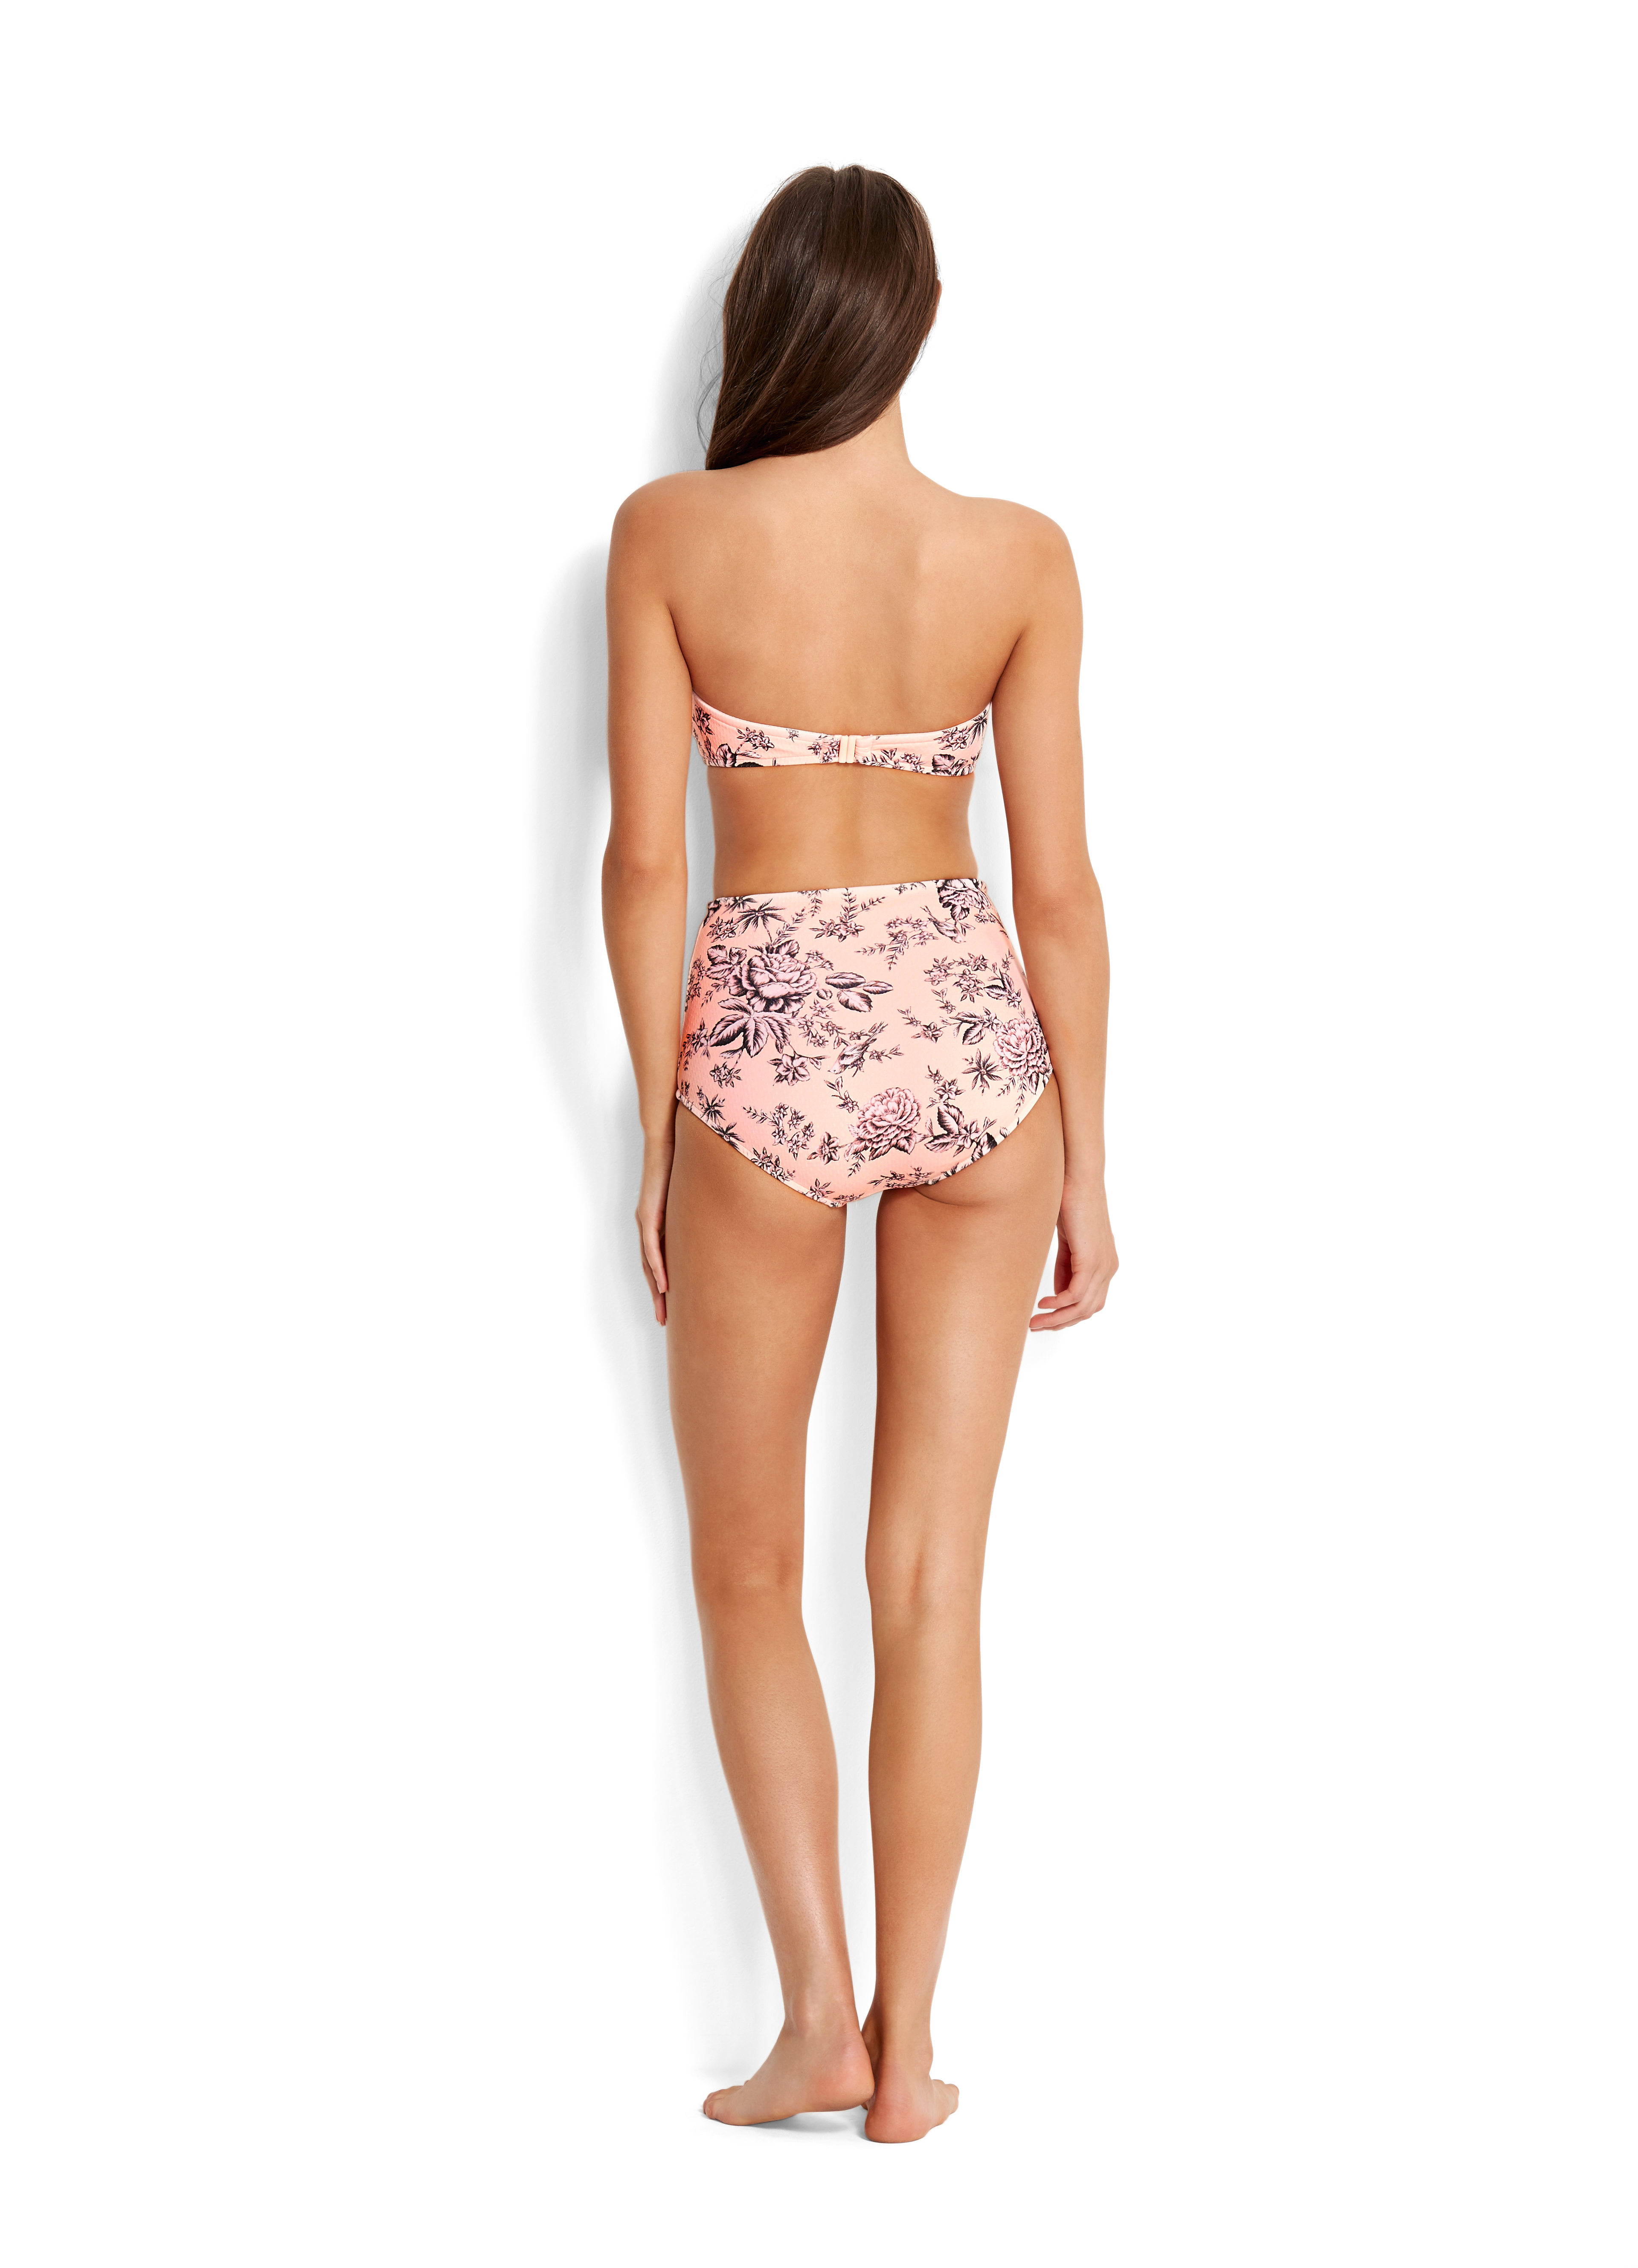 5dfdbd1ee3 Seafolly Love Bird High Waisted Bikini Pant - Peach | Dolphin Swimware